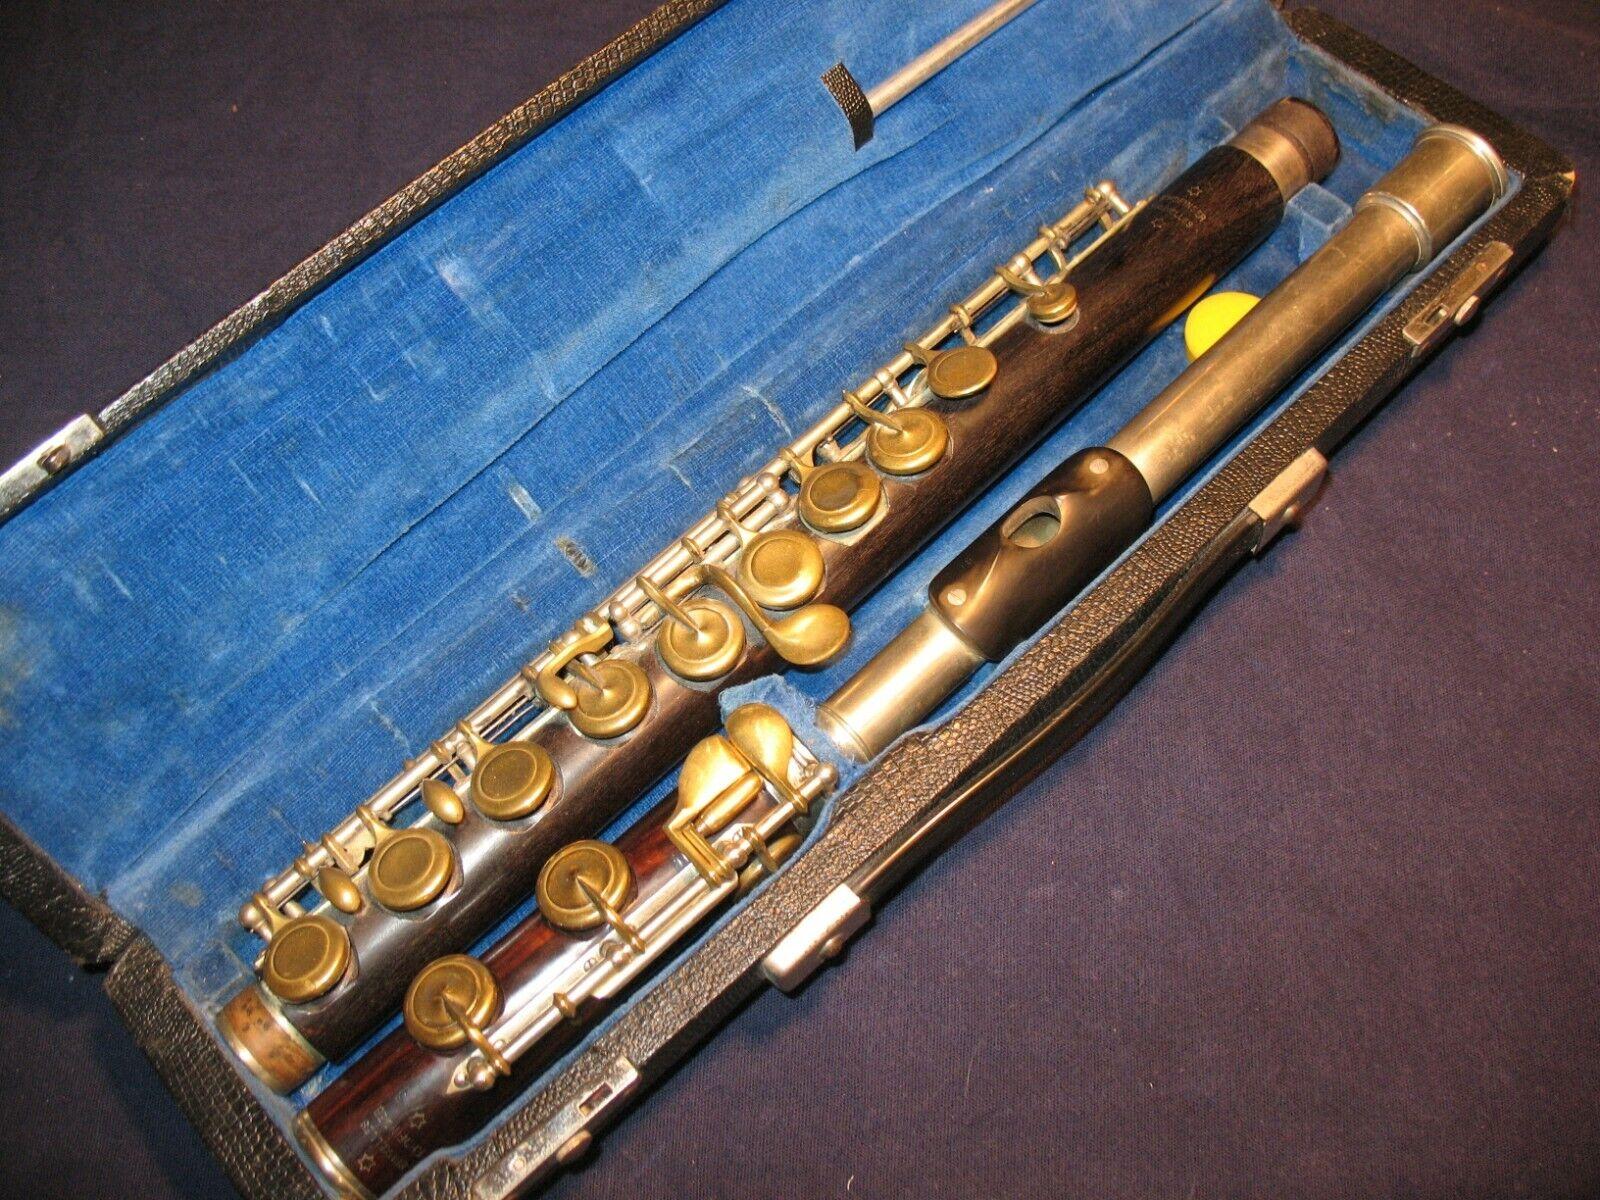 F. Hofinger Bruxelles, Holz Querflöte, Holzquerflöte, wood wooden flute